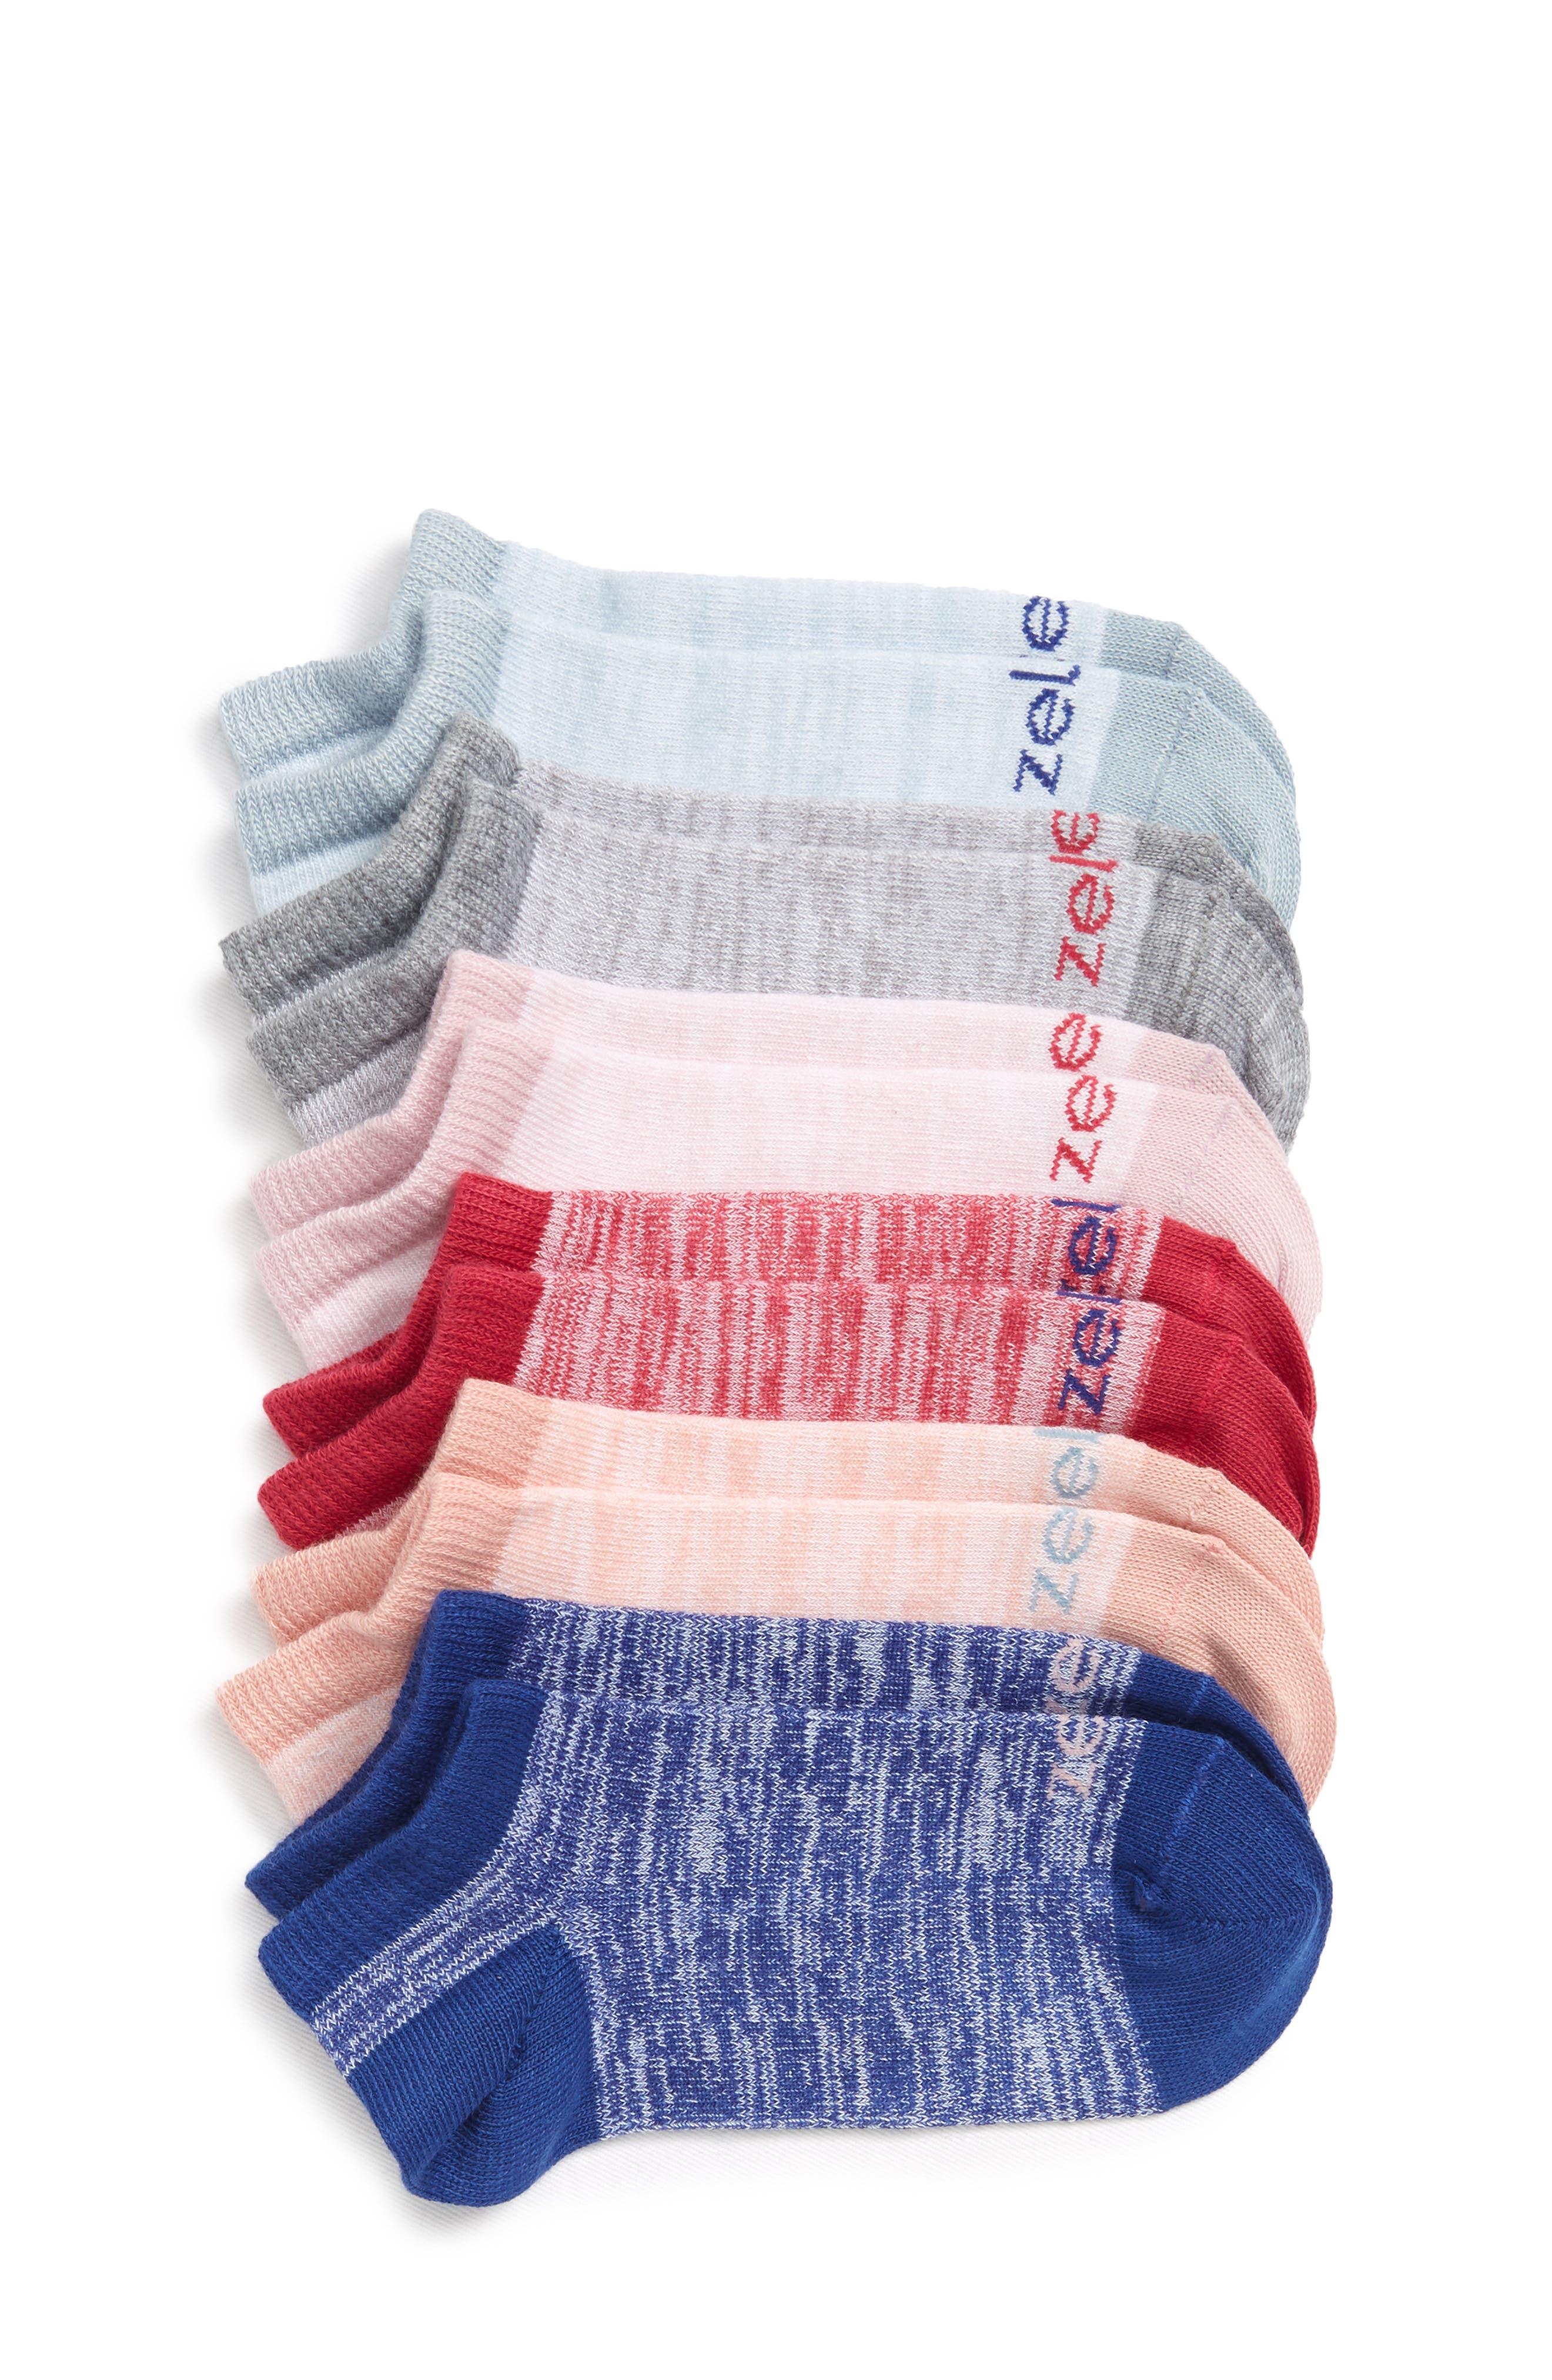 6-Pack Ankle Socks,                         Main,                         color,